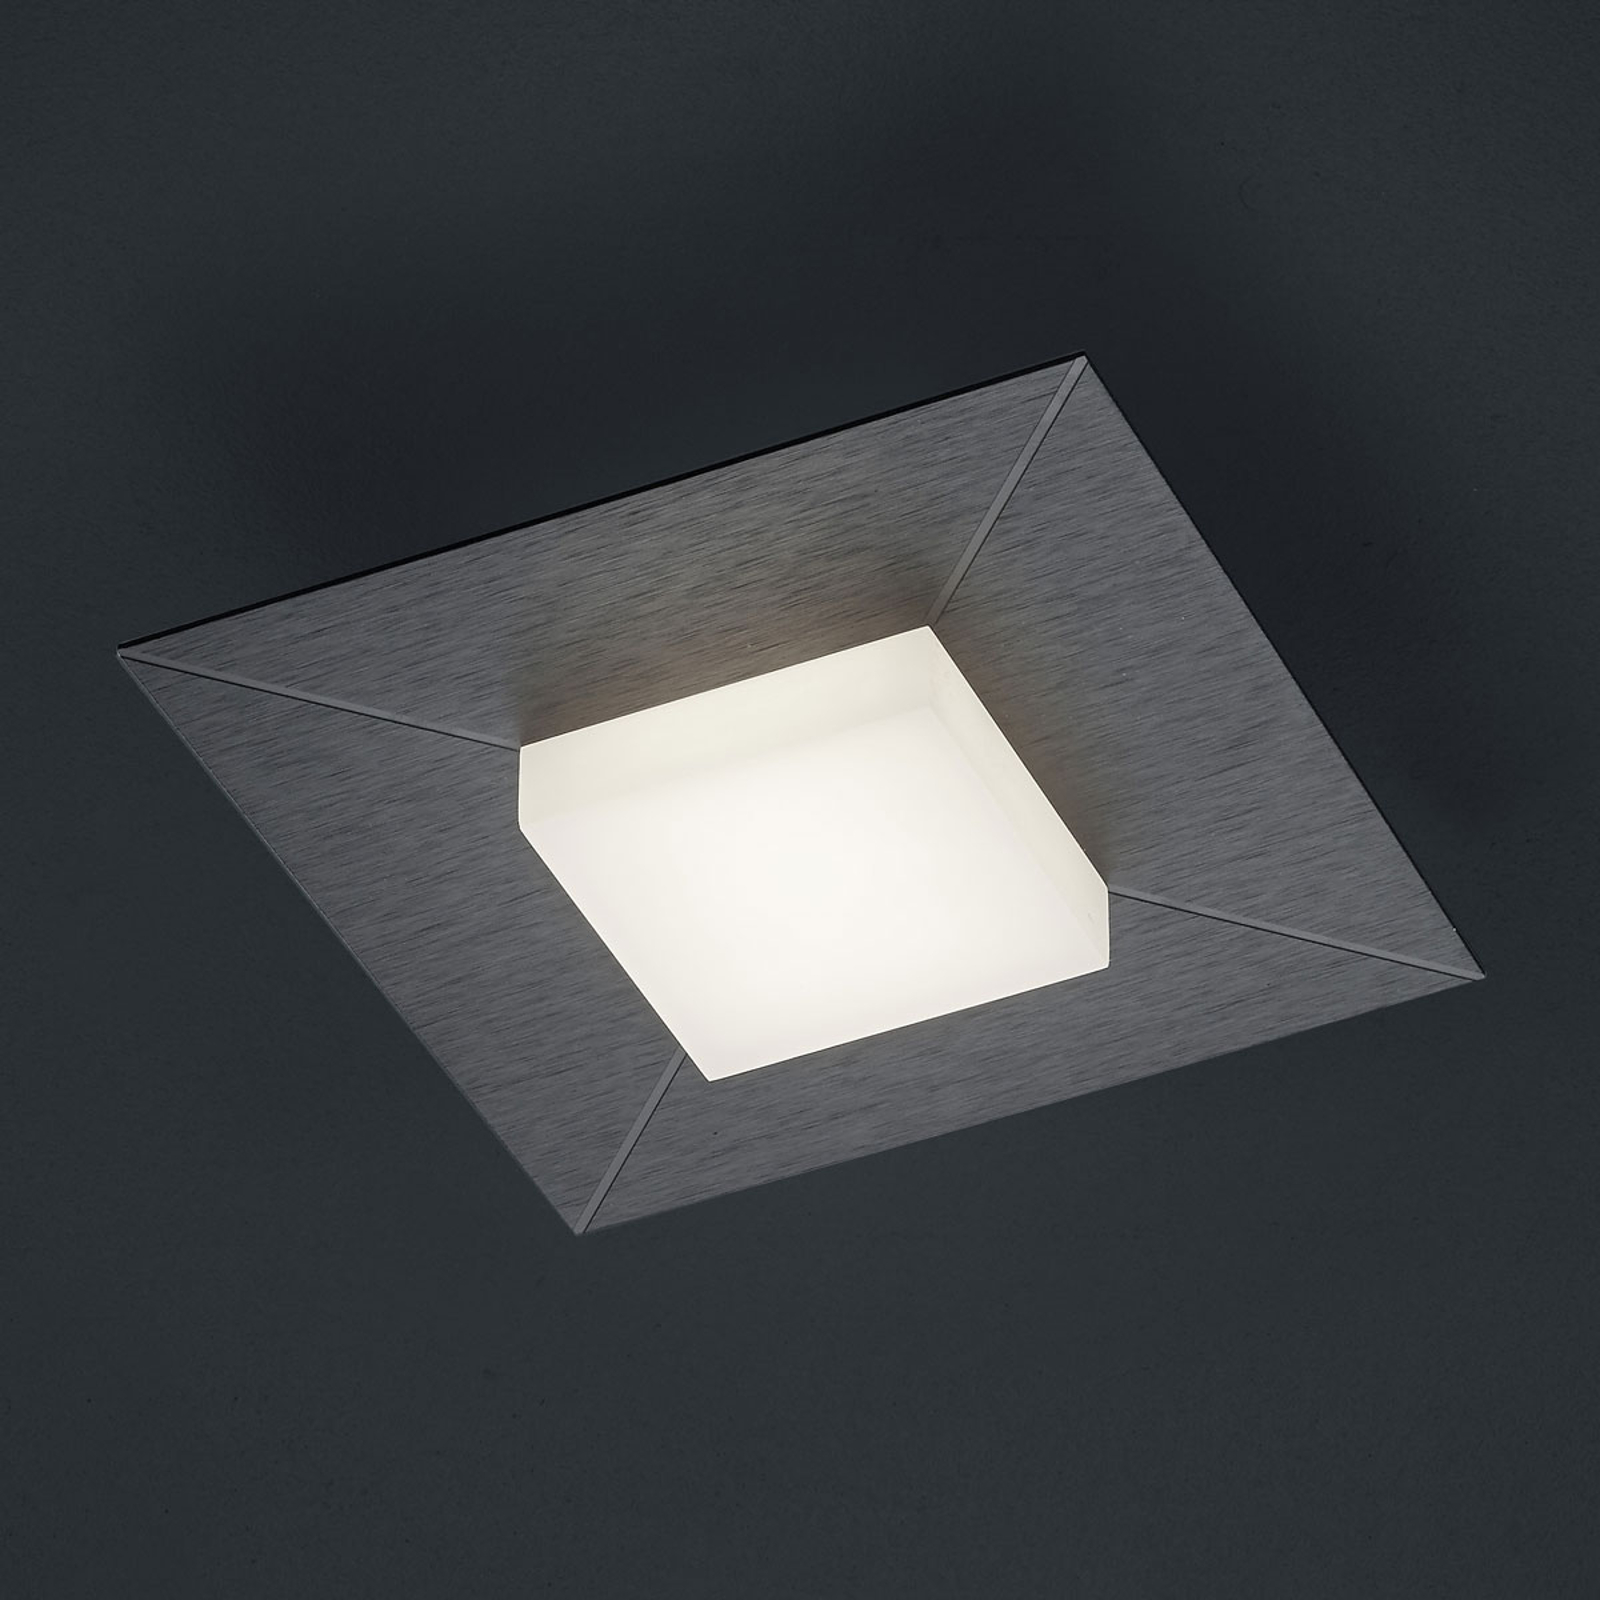 BANKAMP Diamond taklampe 17x17 cm, antrasitt